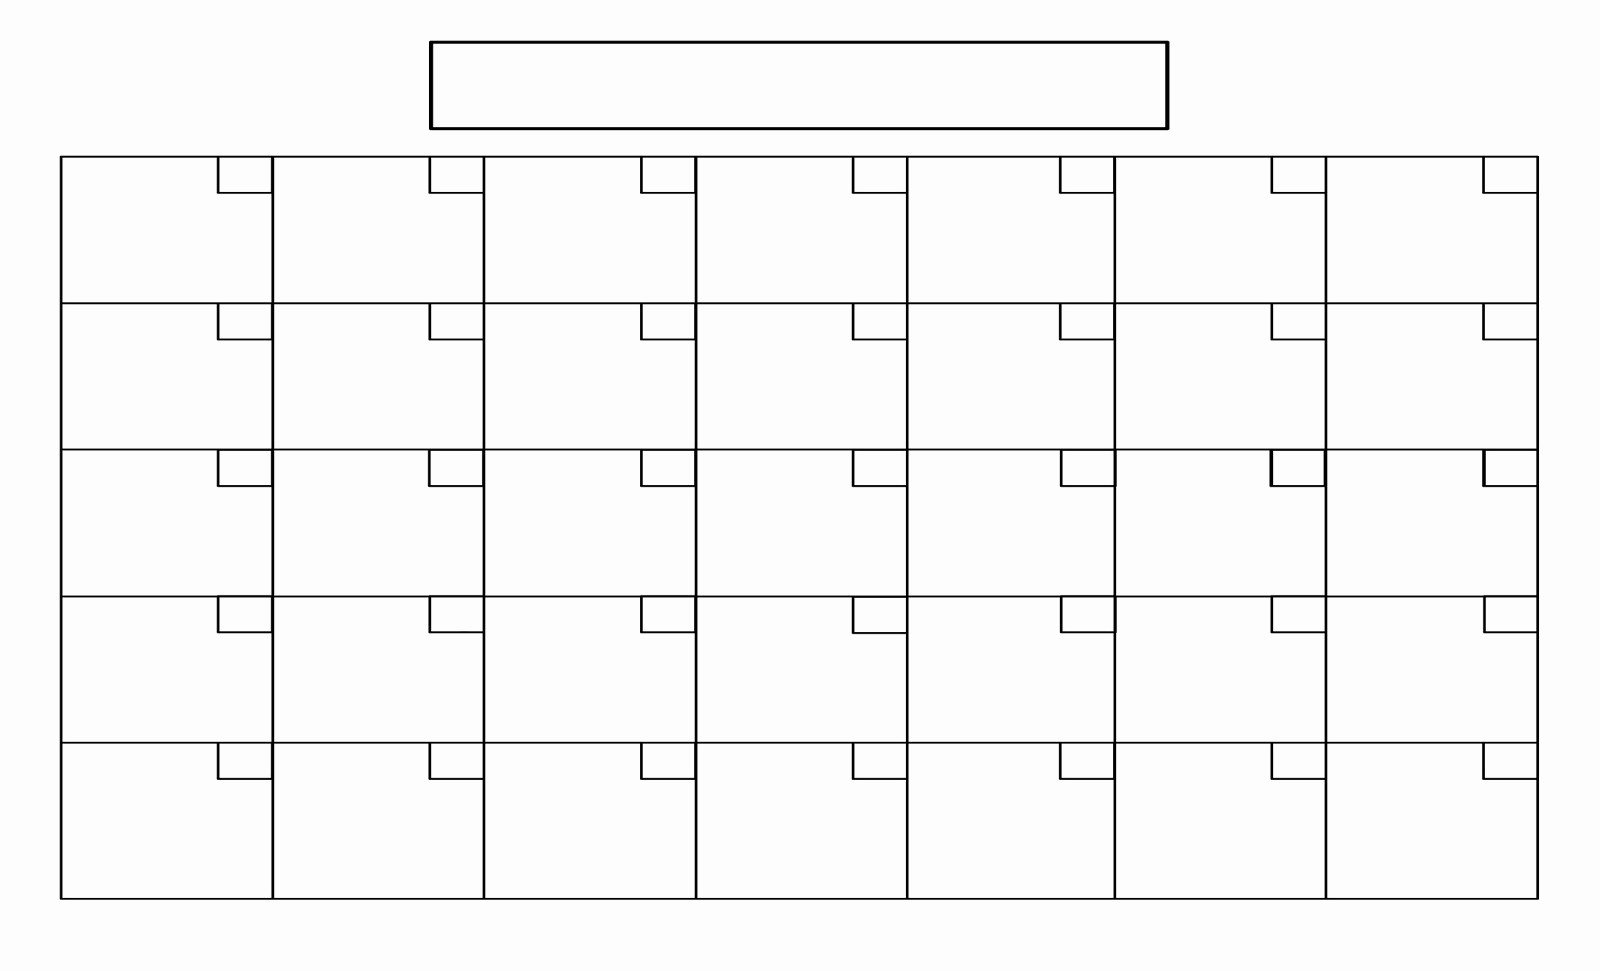 Calendar Fill In Templates | Example Calendar Printable How To Fill In Calendar & Print